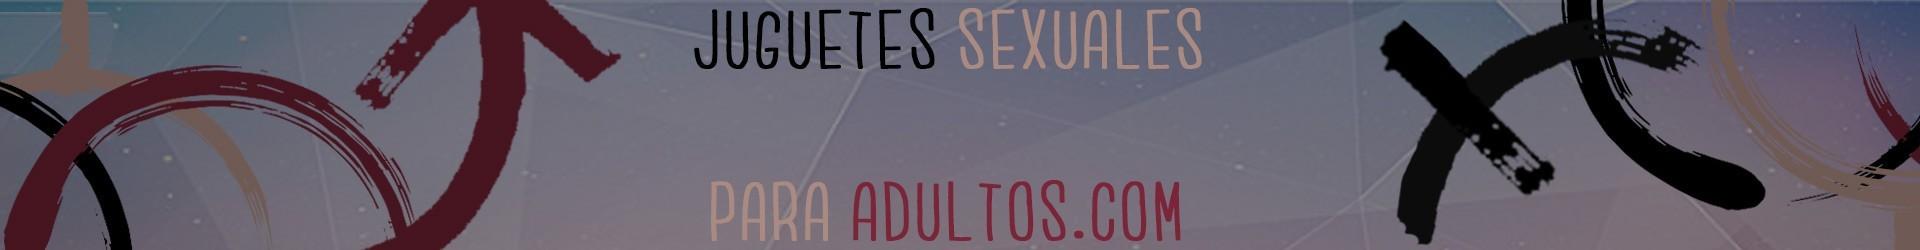 Camisetas - Sex Shop Juguetes Sexuales